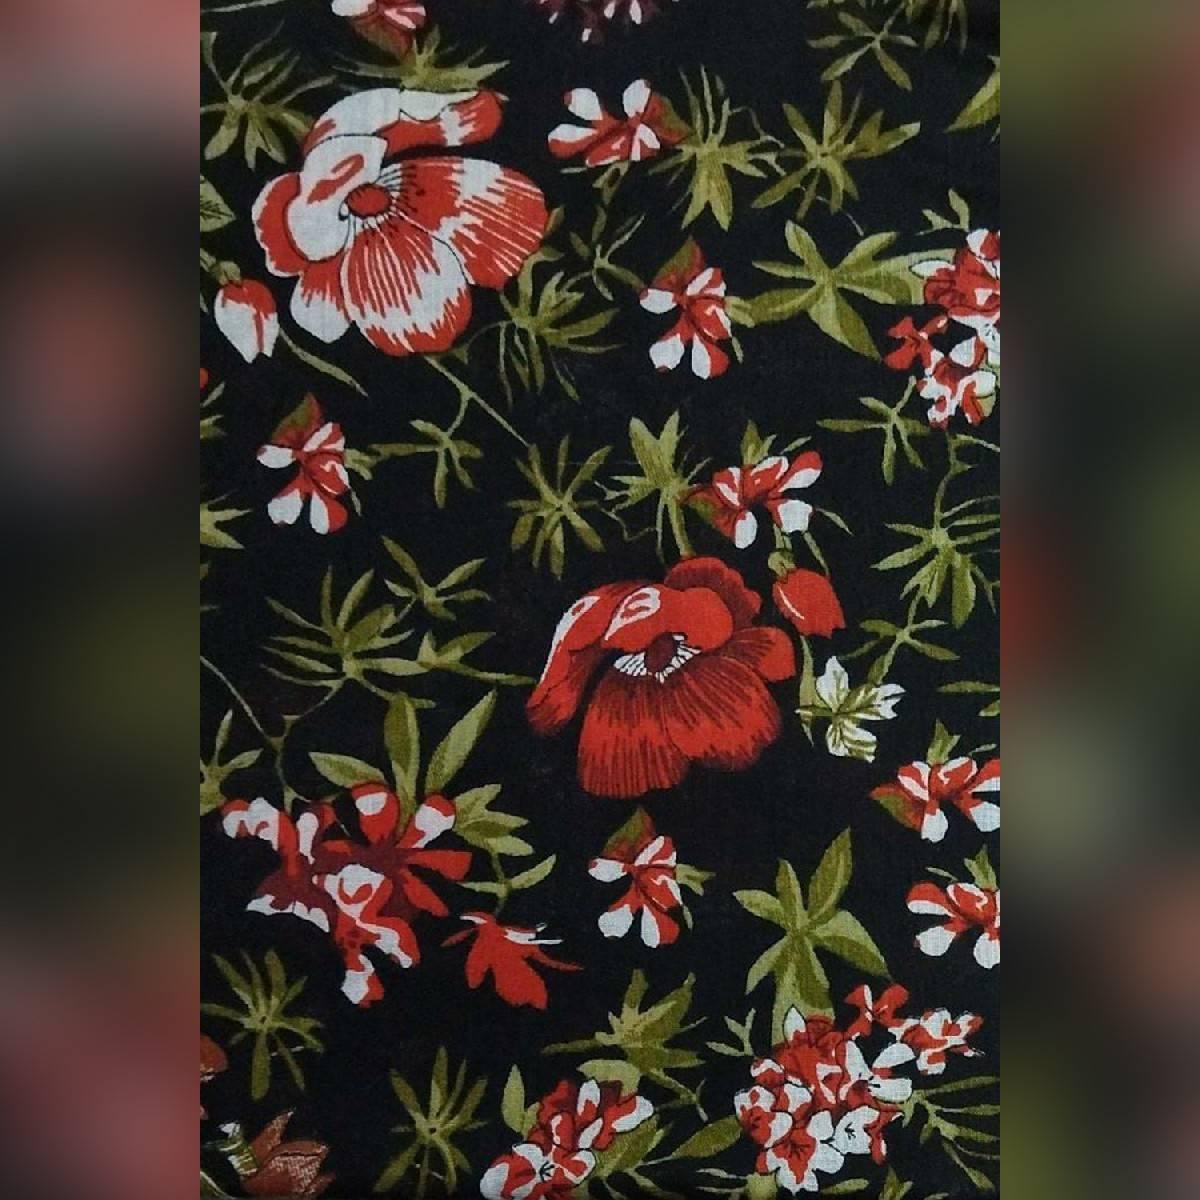 Ittehad Textile WomanLF-RHT-21507C1 Pcs Rahat Lawn Kurti unstitched Fabric Summer 2021